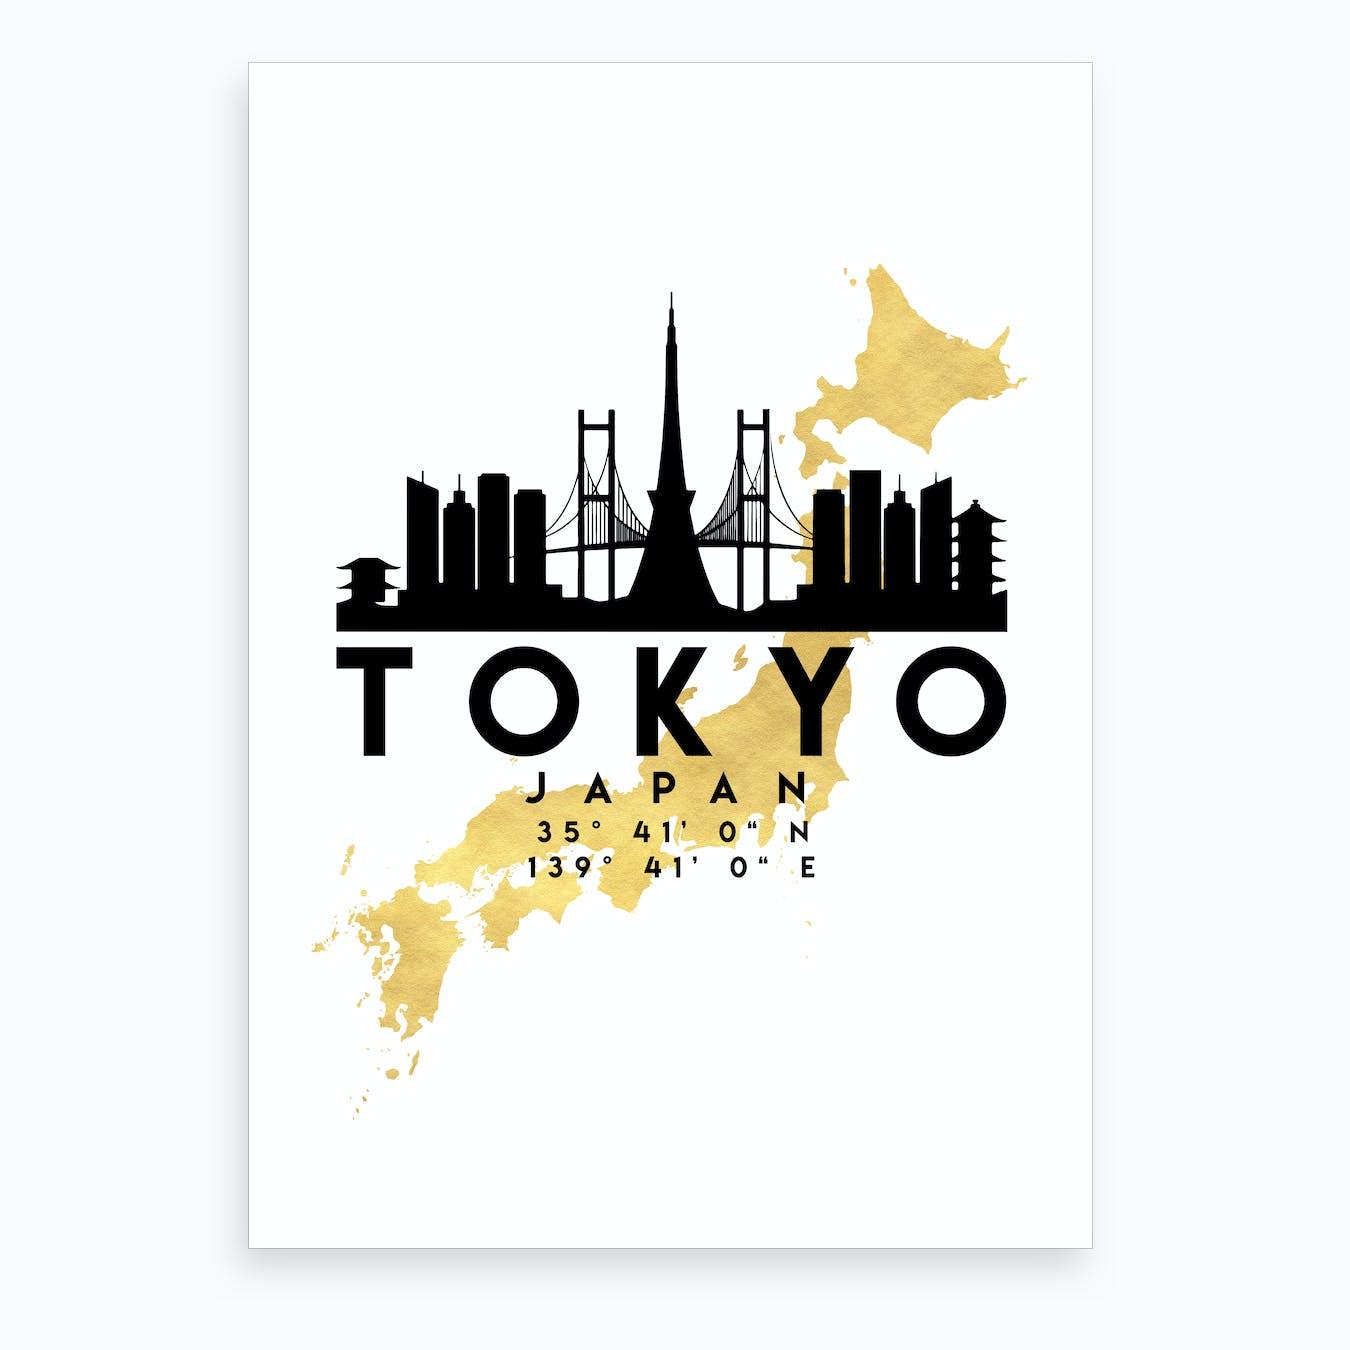 Tokyo Japan Silhouette City Skyline Map